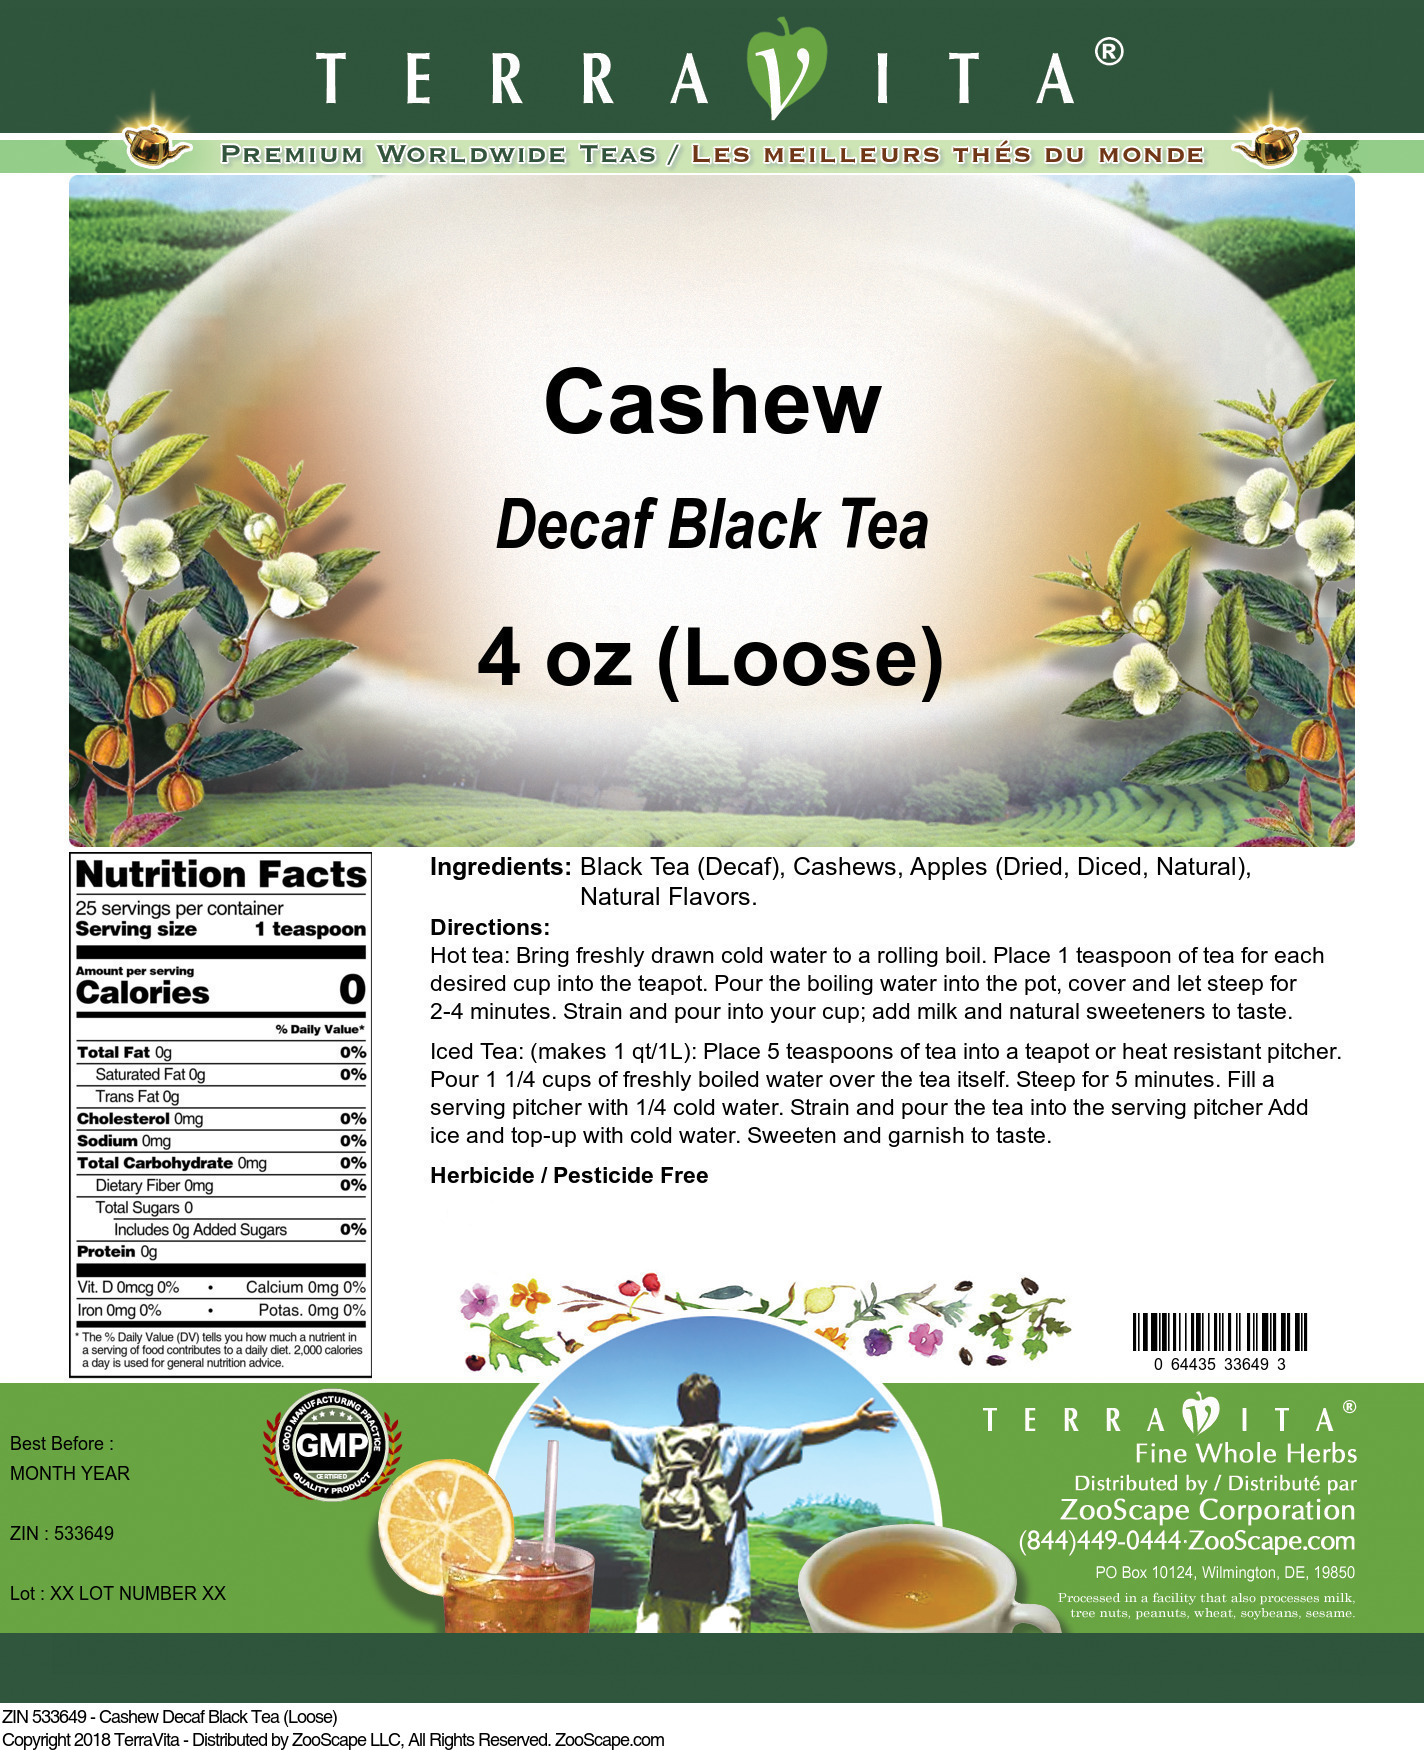 Cashew Decaf Black Tea (Loose)